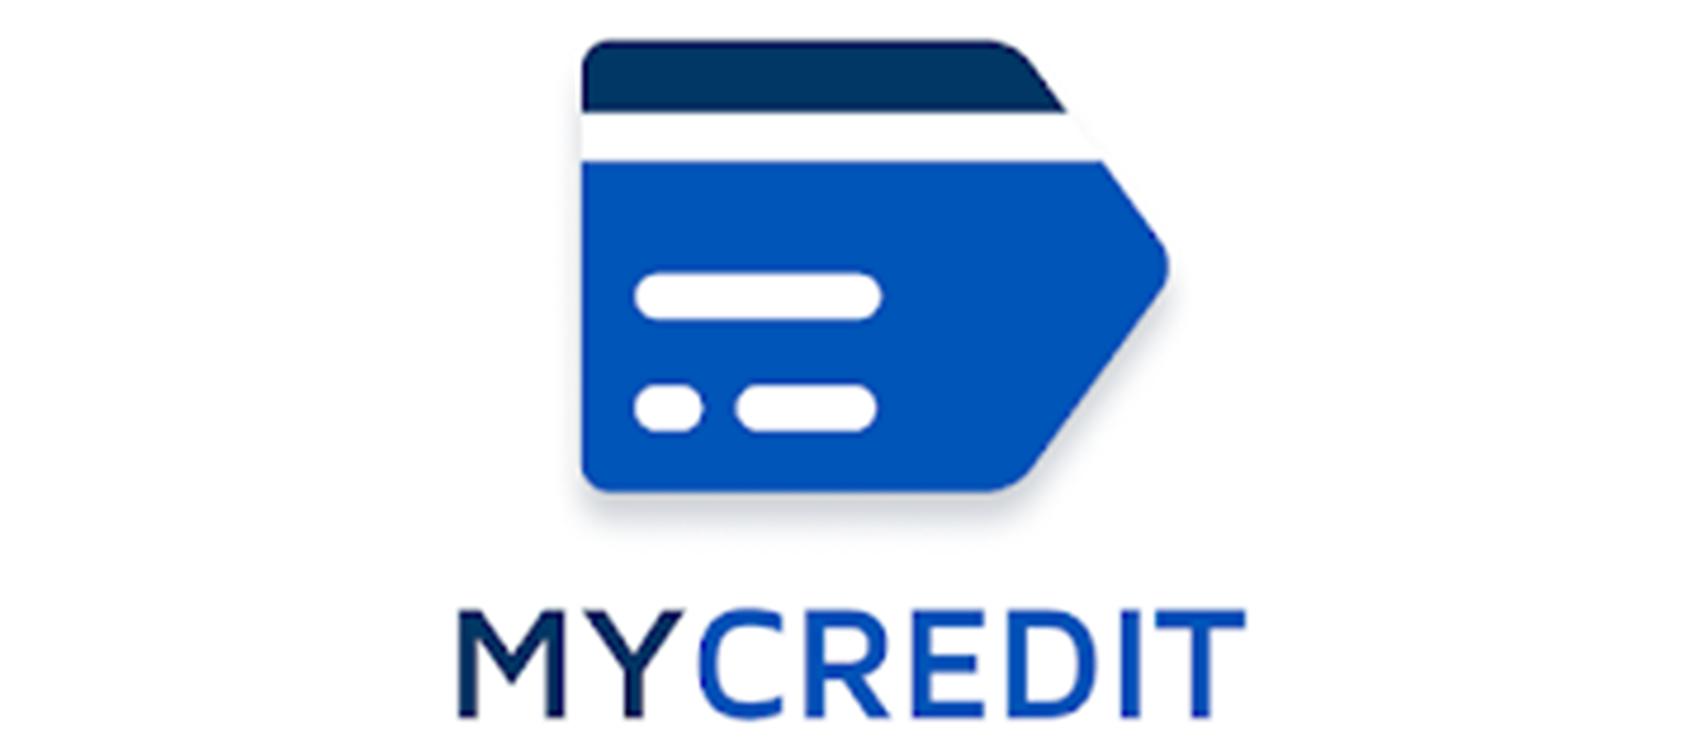 My Credit  (погашение кредита)